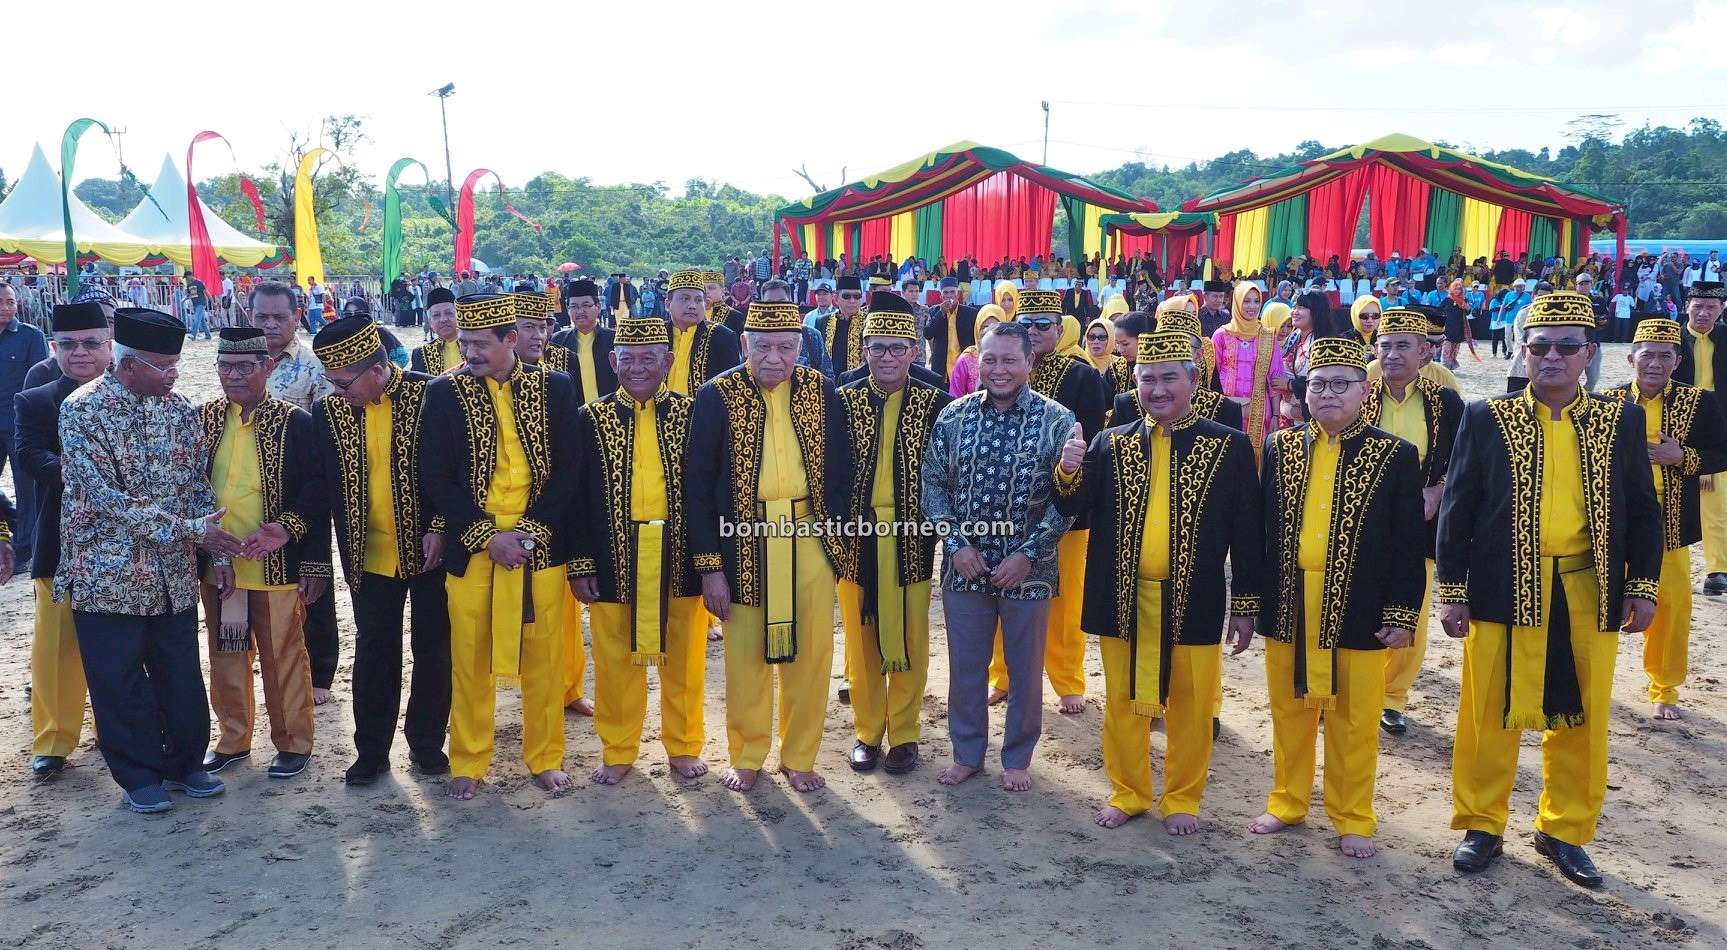 Festival Iraw Tengkayu, upacara adat, indigenous, destination, event, Ethnic, tribal, Kalimantan Utara, Pariwisata, Tourism, Tarakan, Pantai Amal, 婆罗洲达雅传统文化, 印尼北加里曼丹, 打拉根土著部落